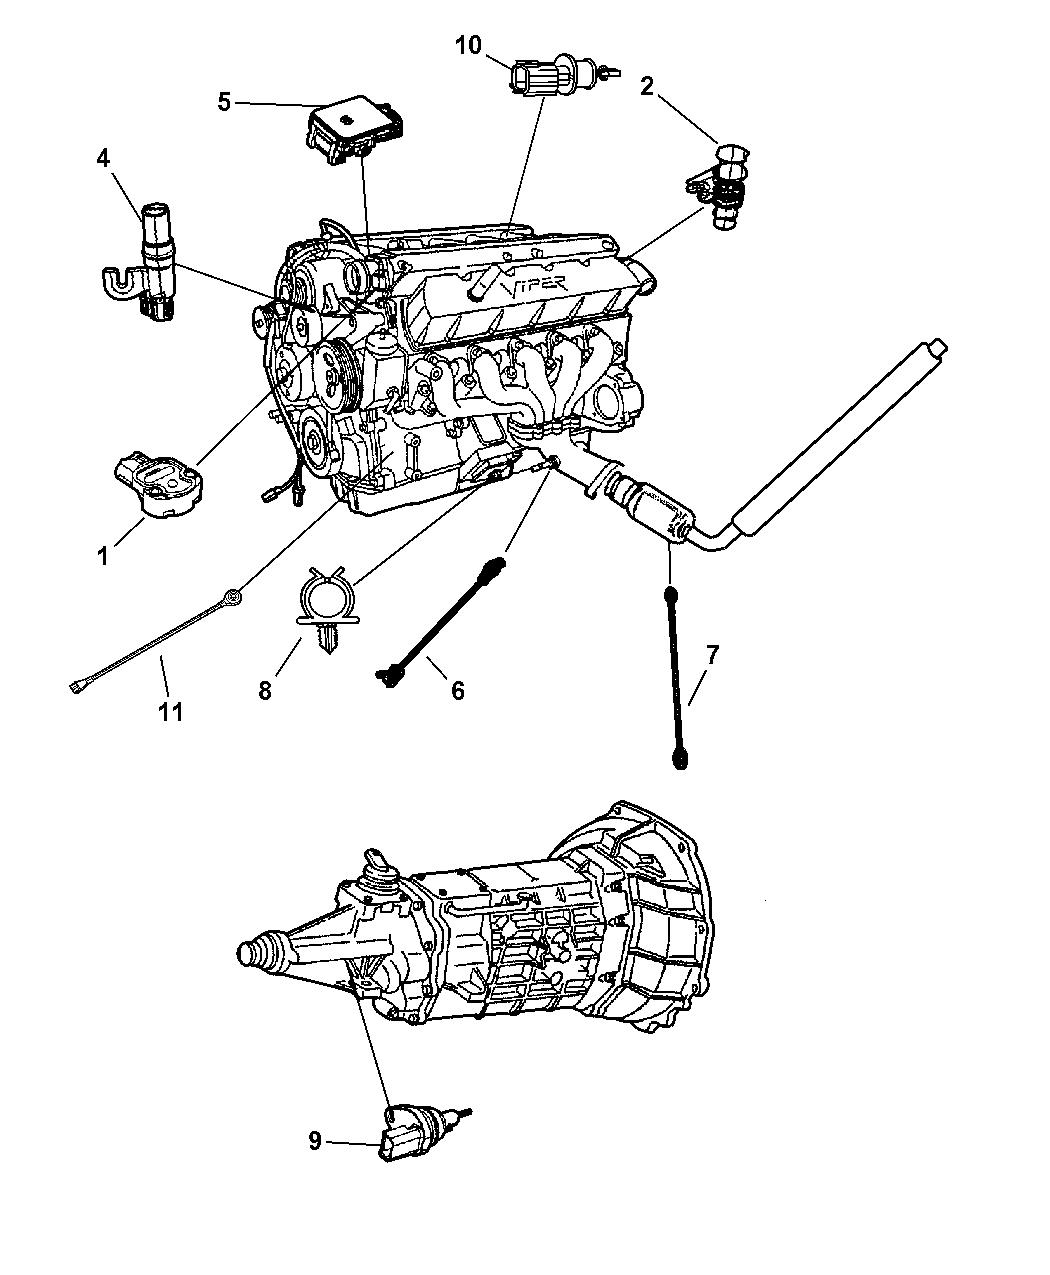 Dodge Viper Wiring Diagram - Wiring Diagram